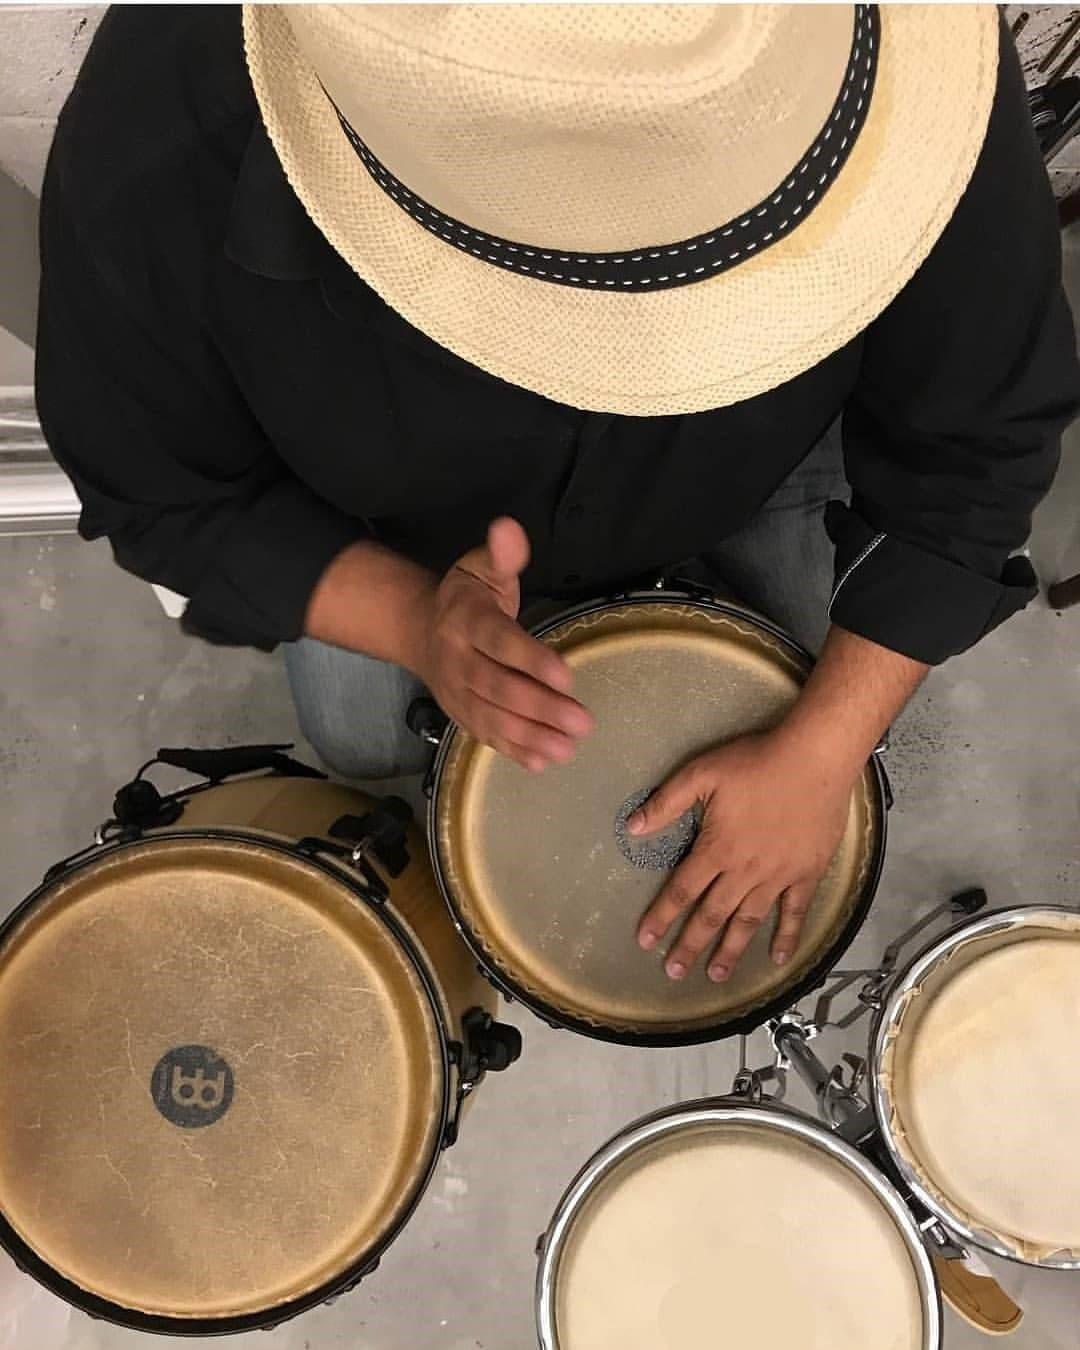 conga player saudi arabia jazz (Supplied)